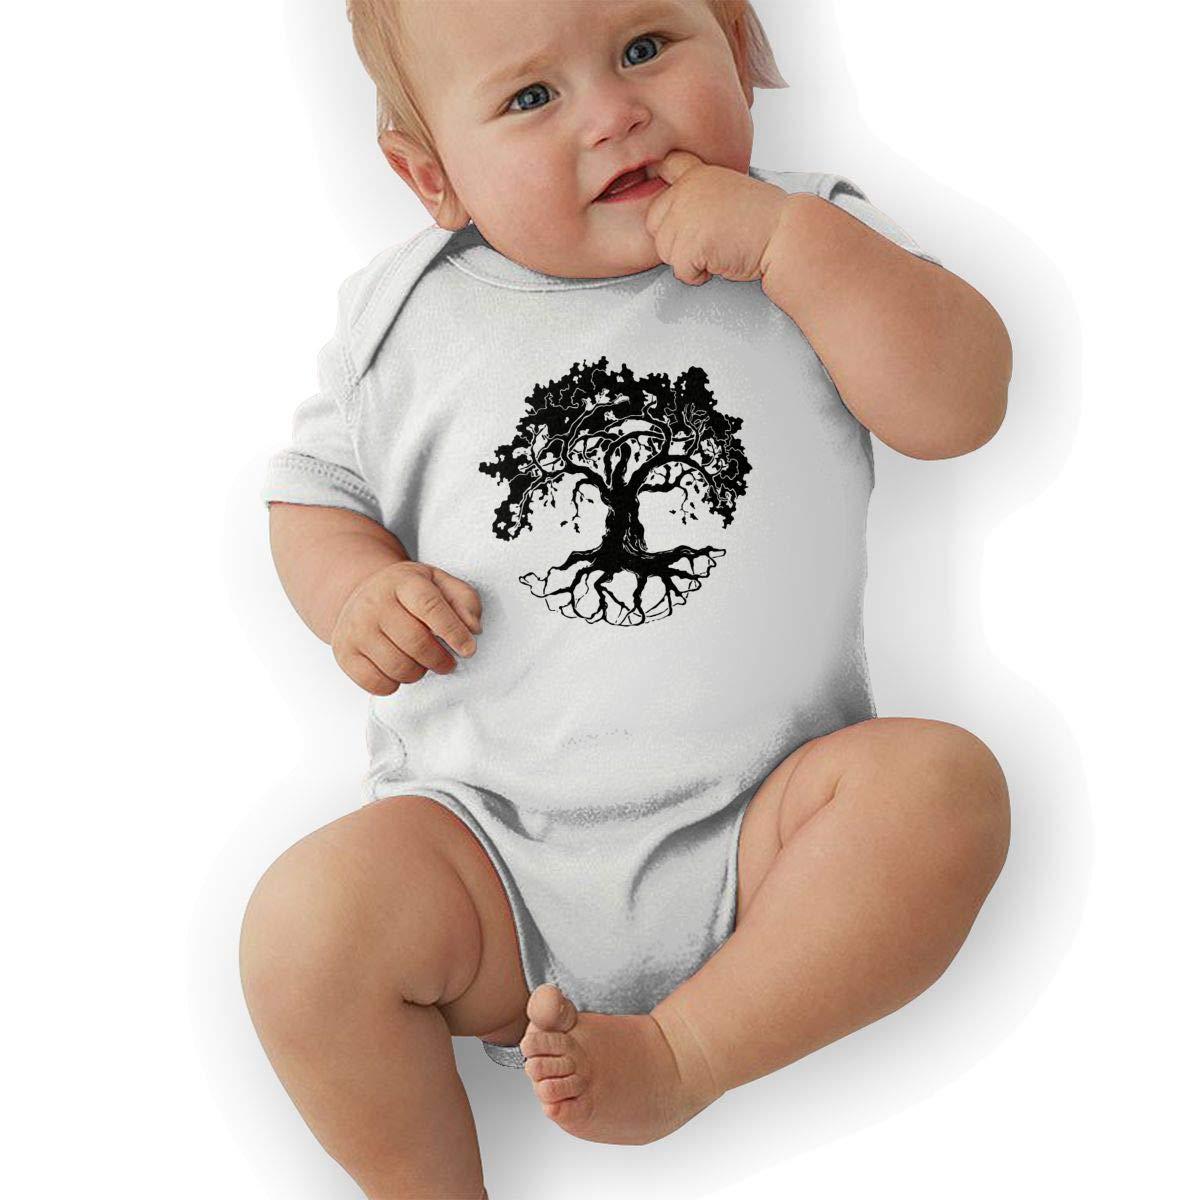 Cute Oak Tree Jumpsuit U88oi-8 Short Sleeve Cotton Bodysuit for Baby Boys and Girls